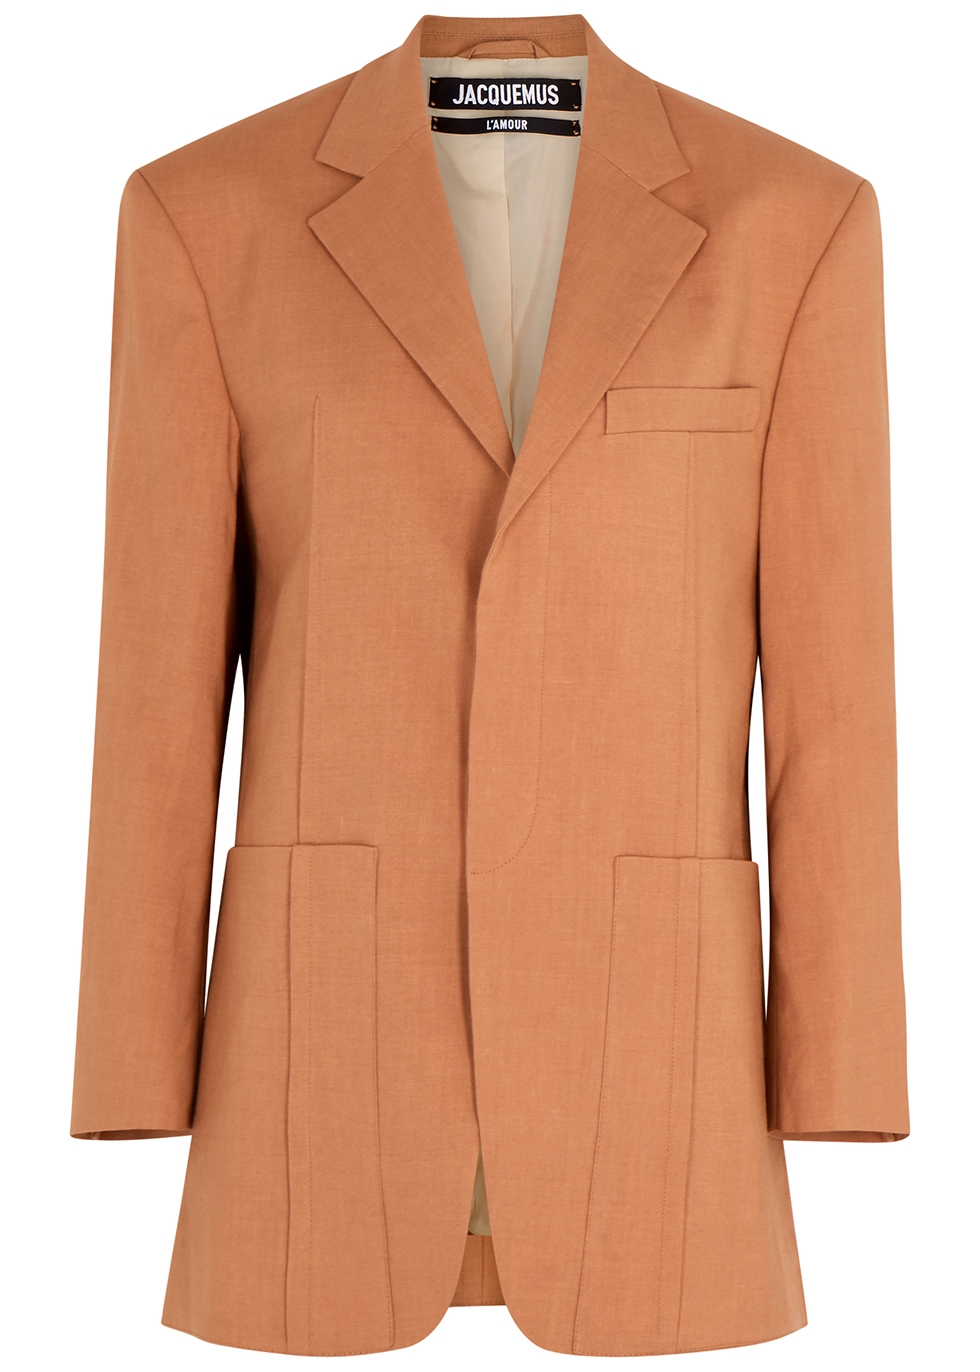 La Veste D'Homme terracotta blazer